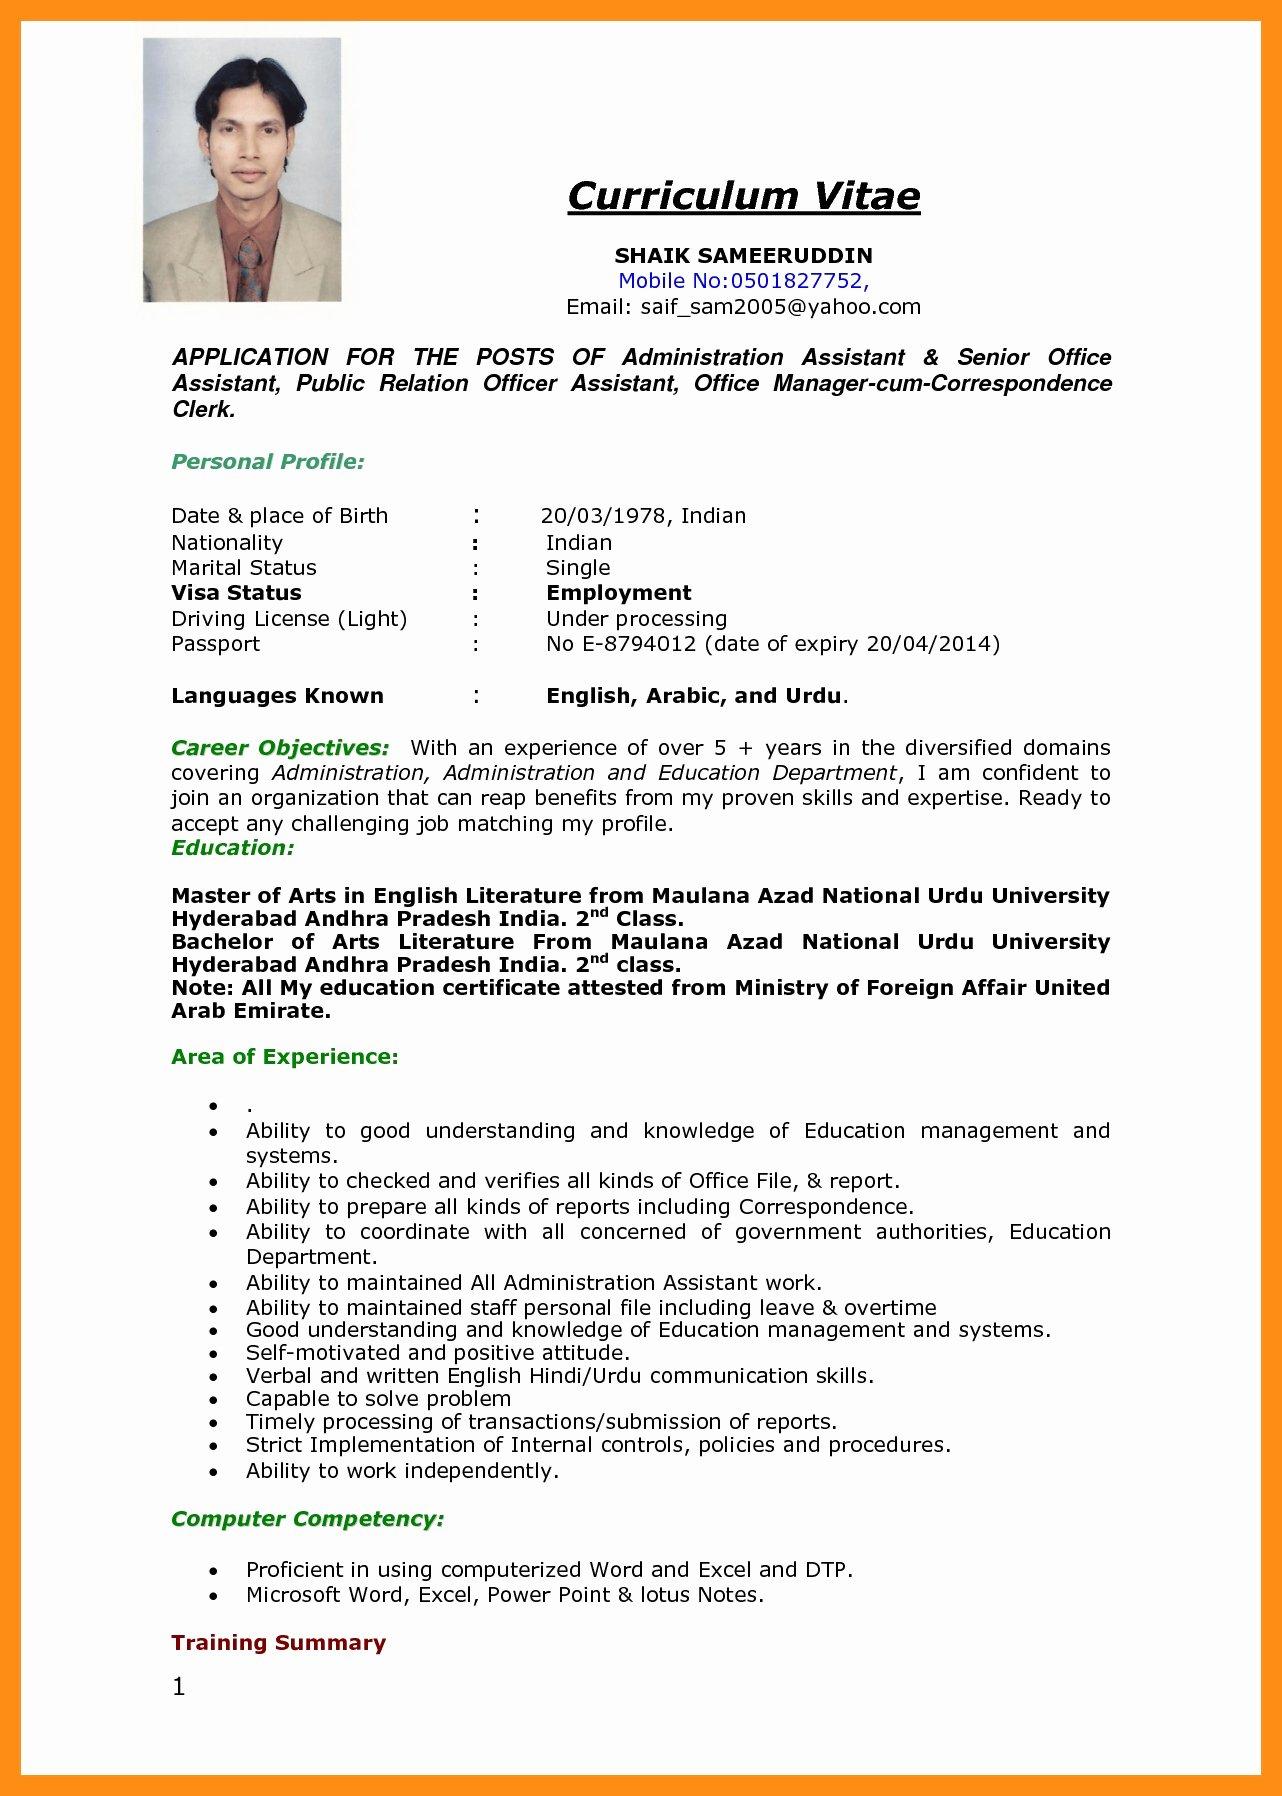 Curriculum Vitae Samples Unique Standard Cv format for Job Application